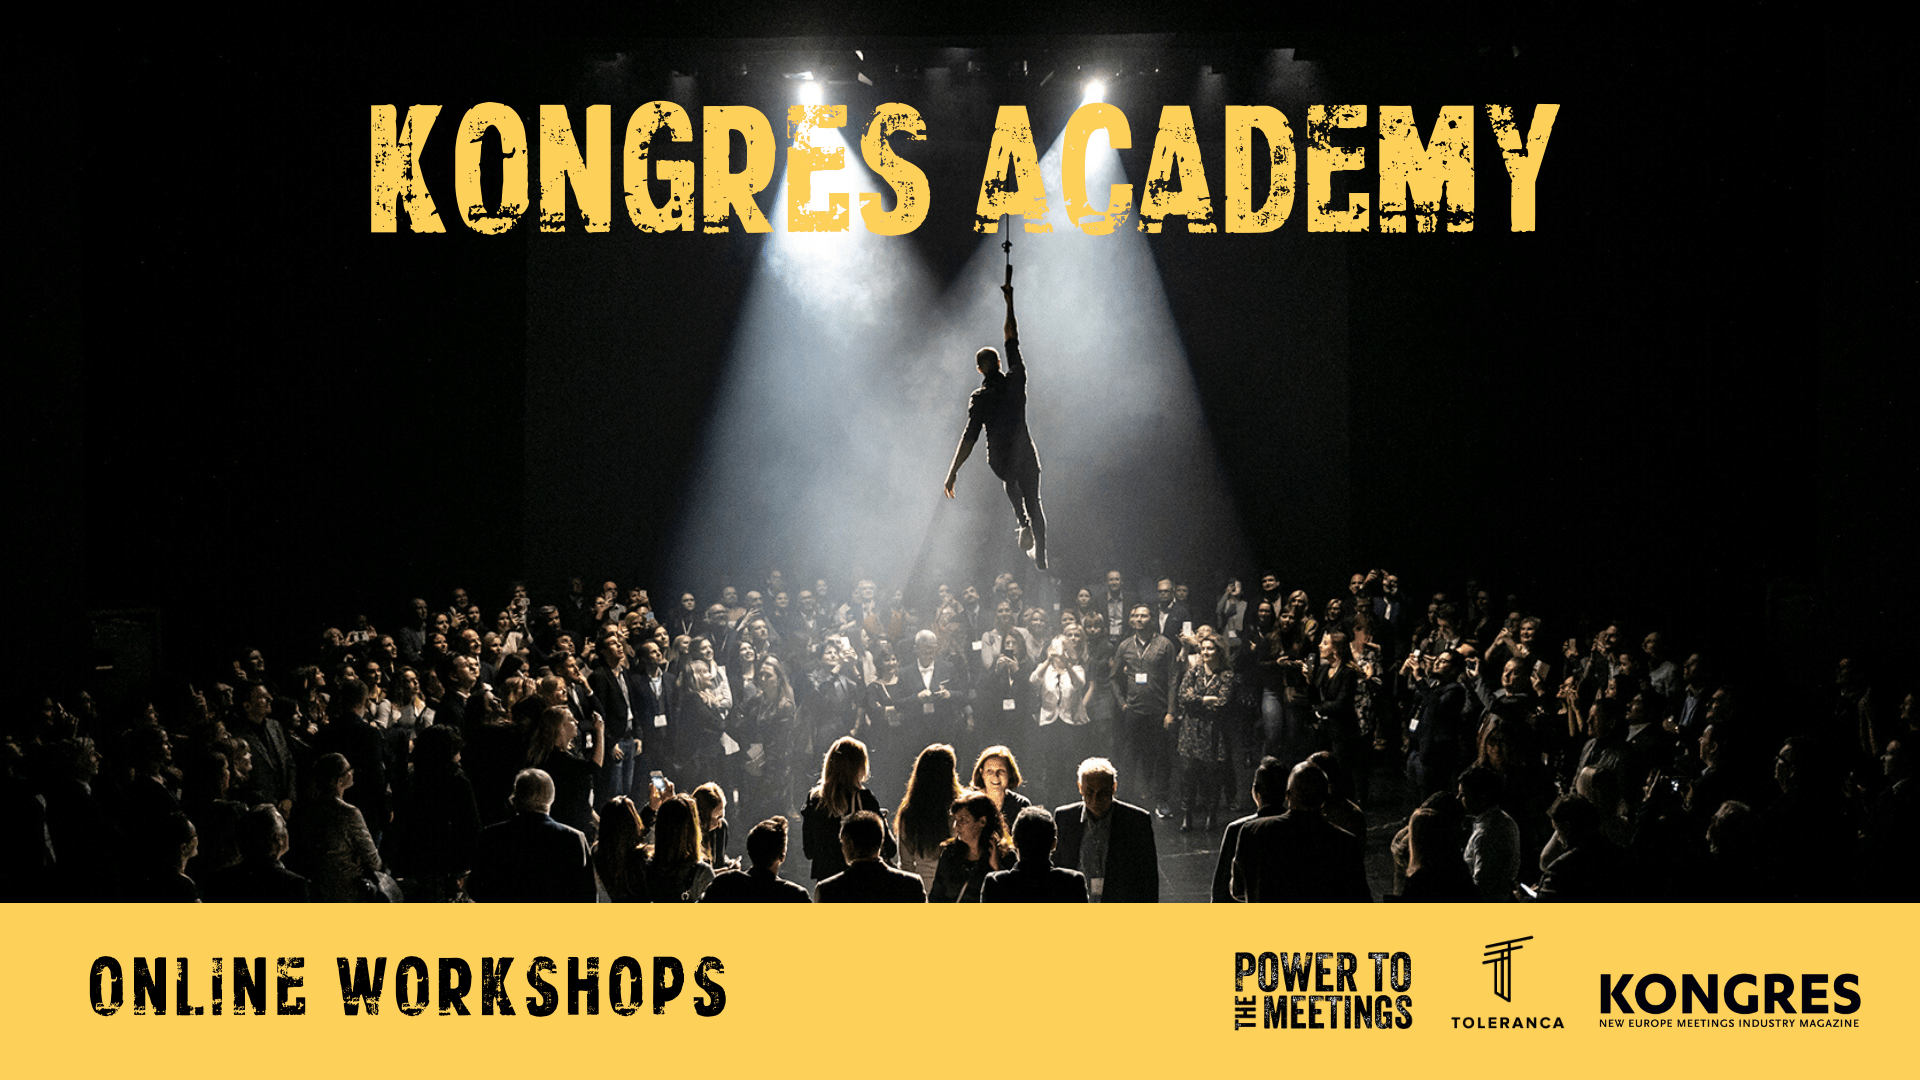 kongres-academy-virtual-workshops